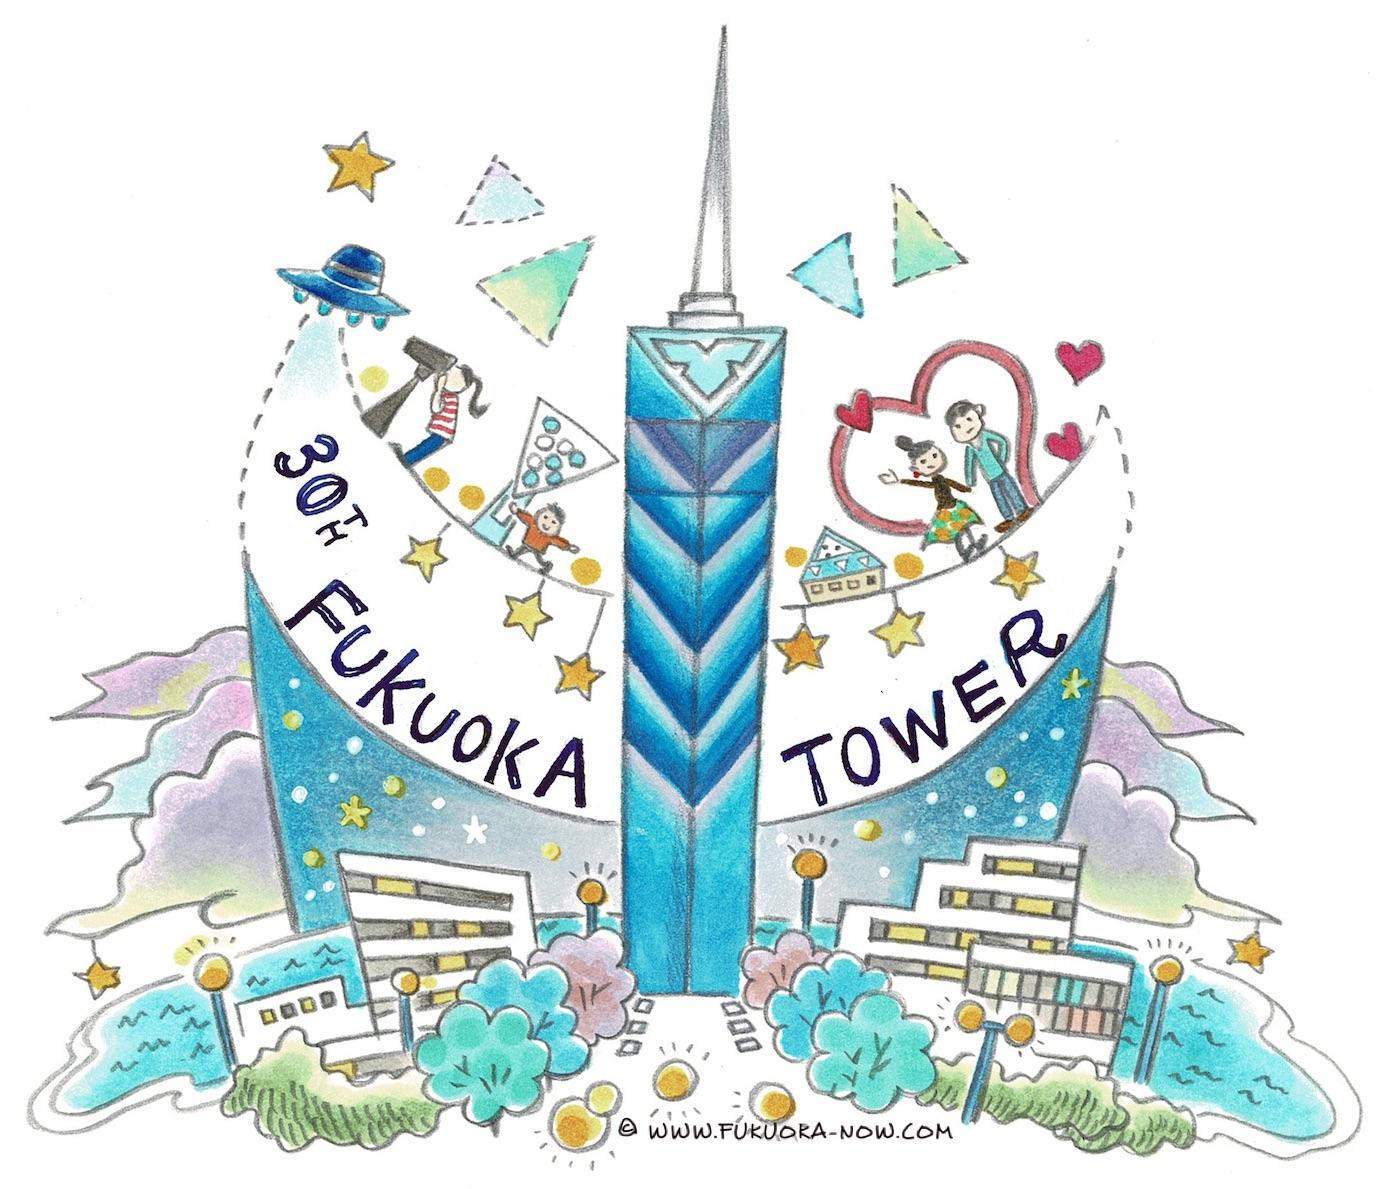 Fukuoka Tower, 30th anniversary